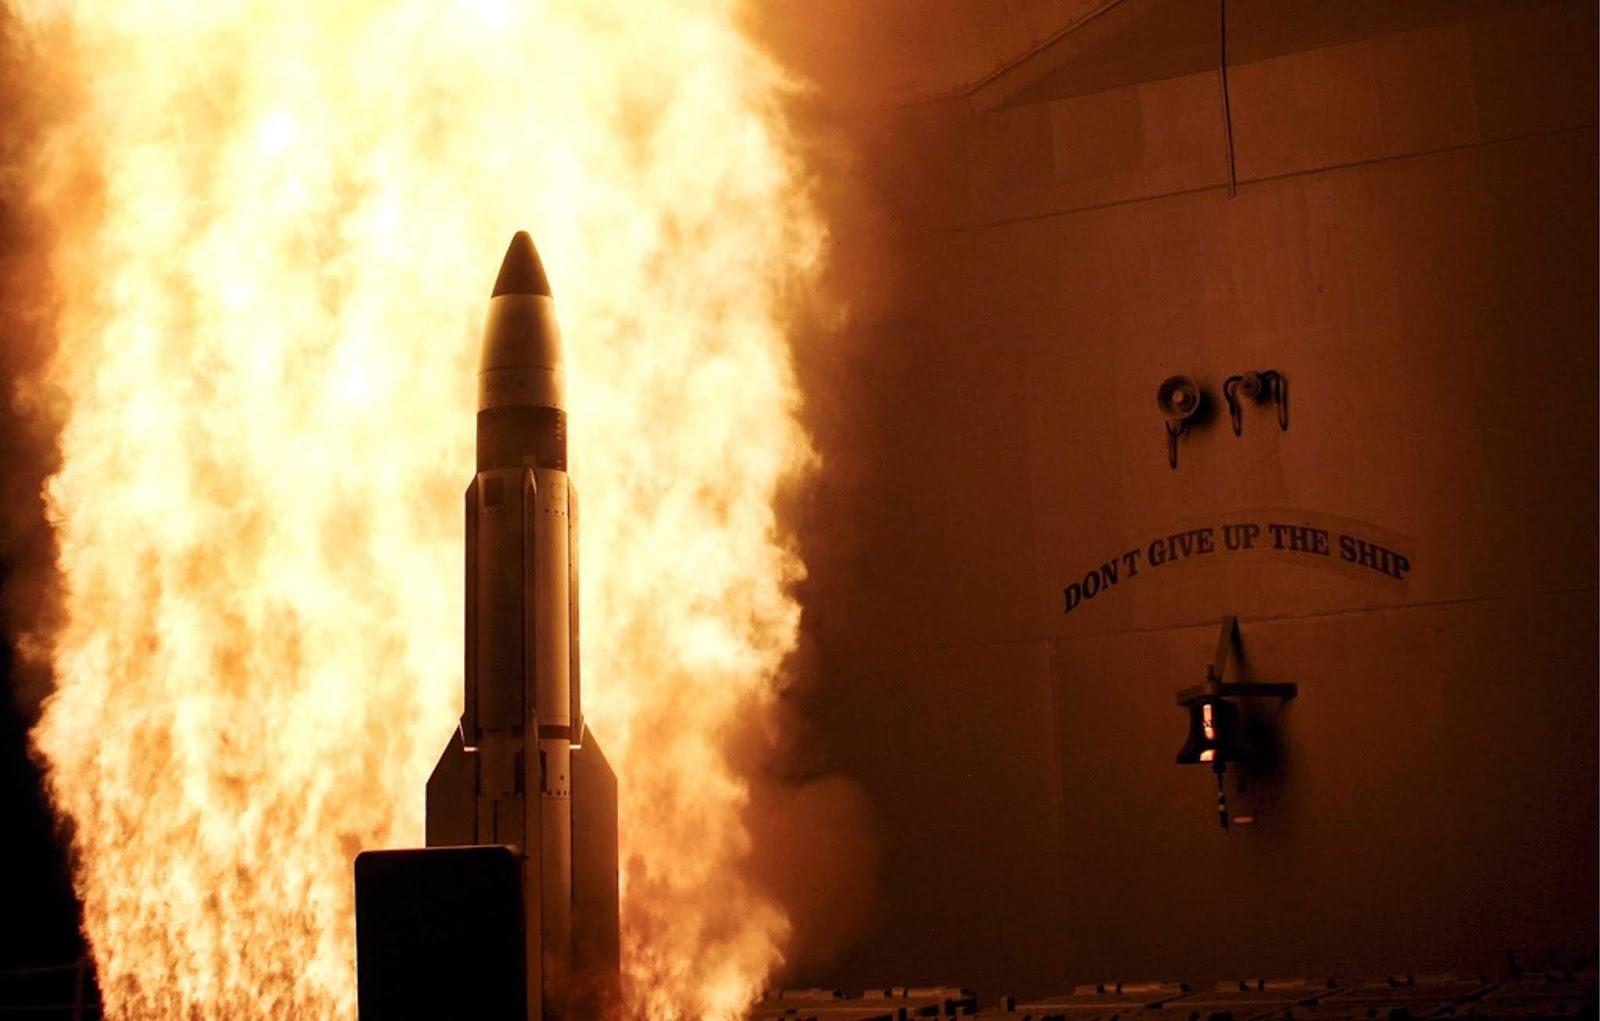 Jenderal Amerika memberi tahu bagaimana Amerika Serikat menangkal serangan nuklir Rusia